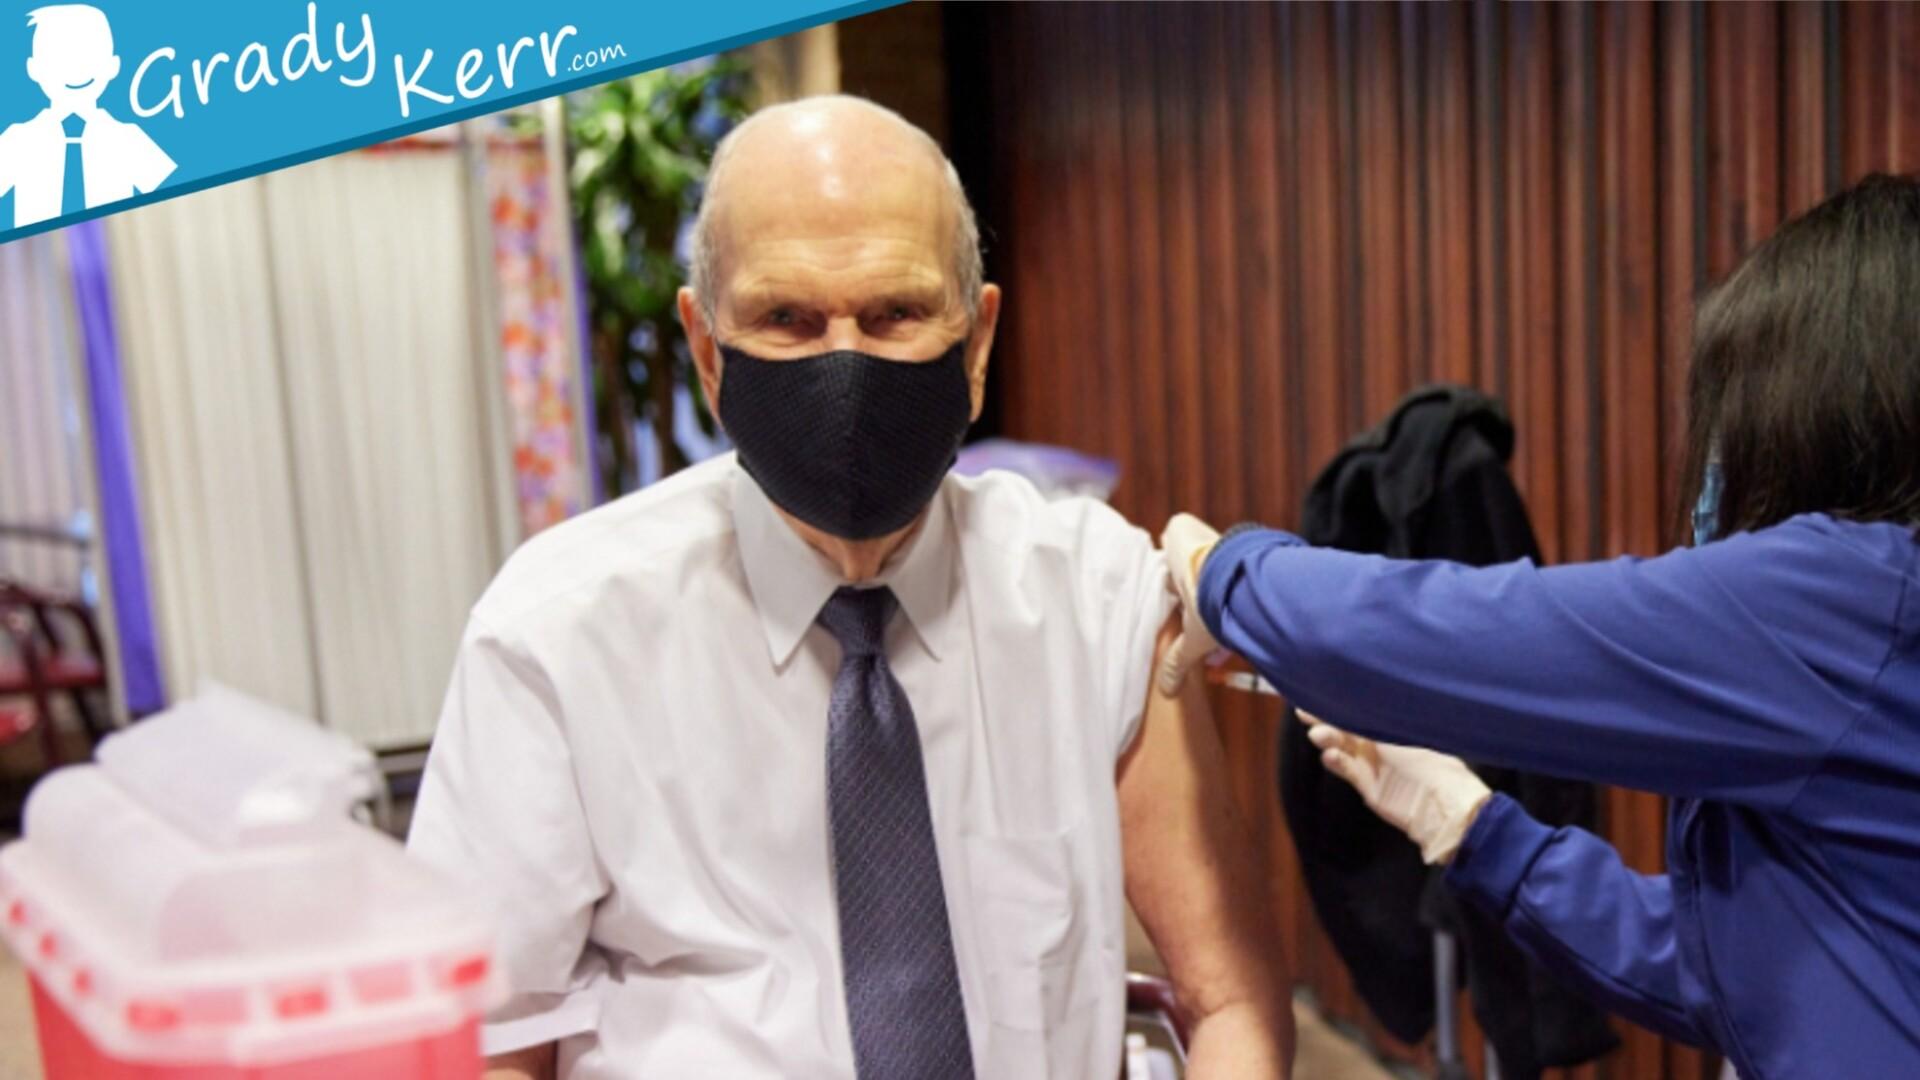 President Nelson COVID Vaccine Dose Administered - GradyKerr.com